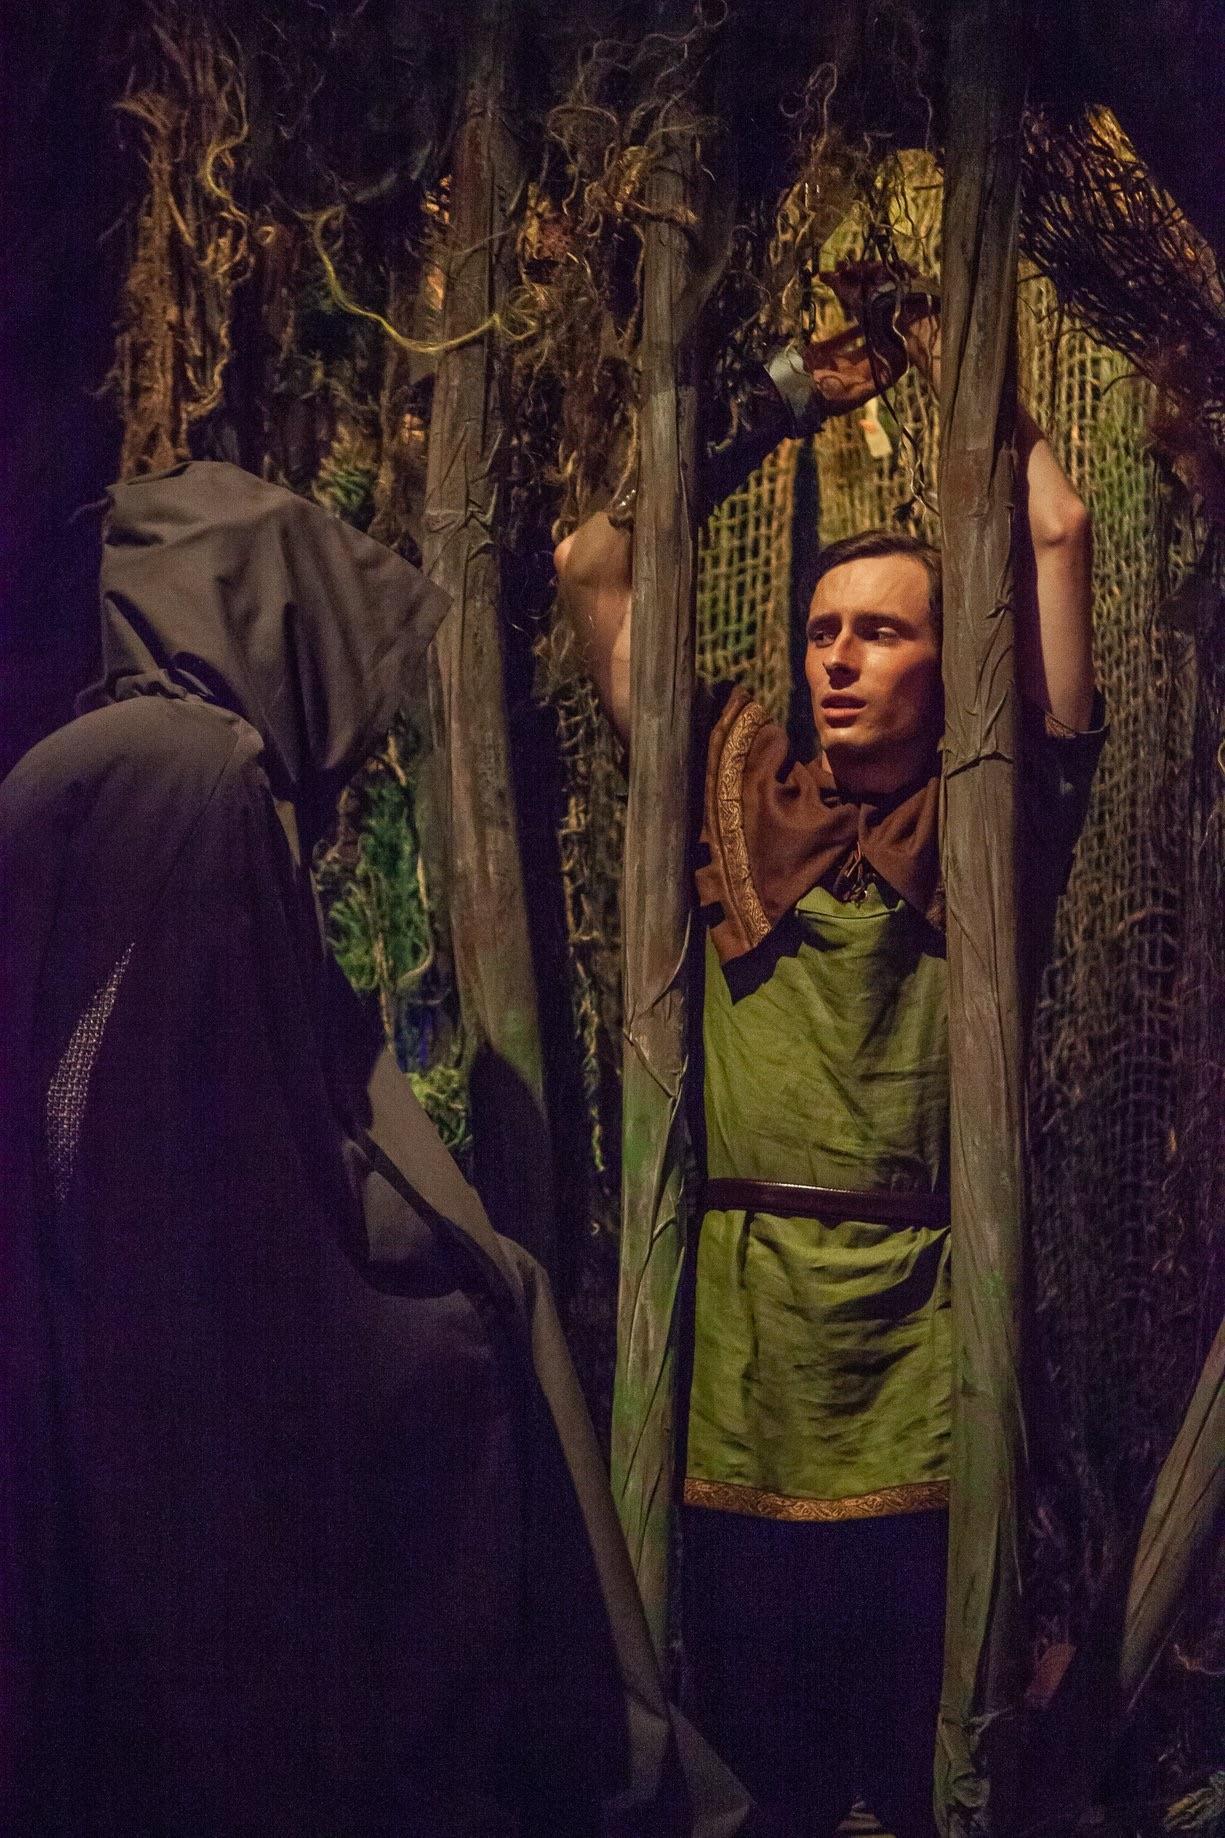 Robin Hood in 'Sherwood'